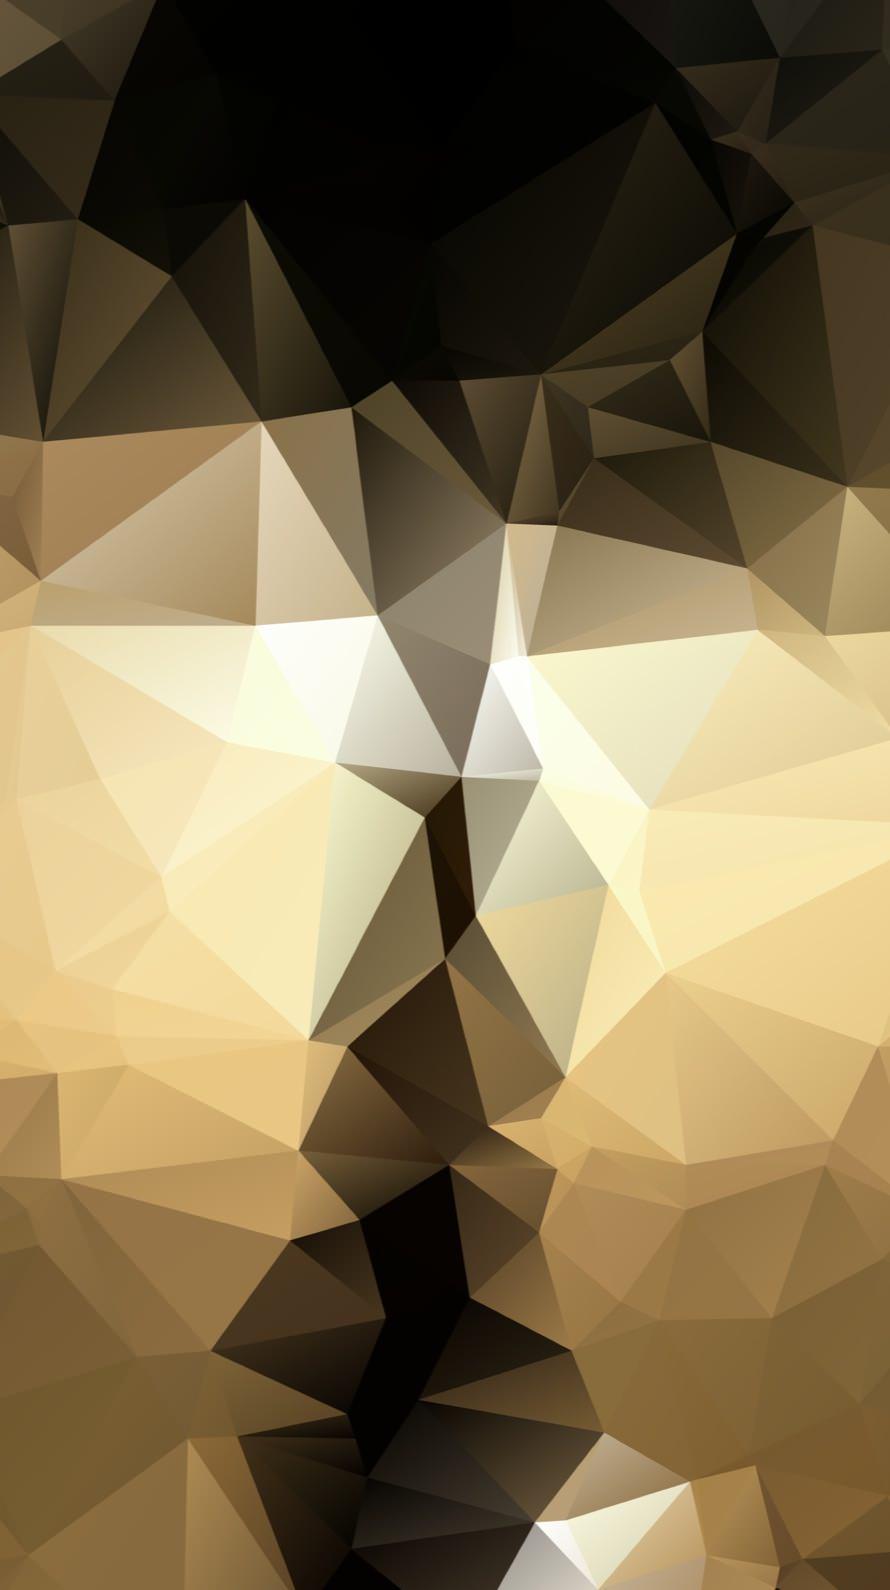 Wallpaper iphone gold - Pattern Gold Wallpaper Sc Iphone6